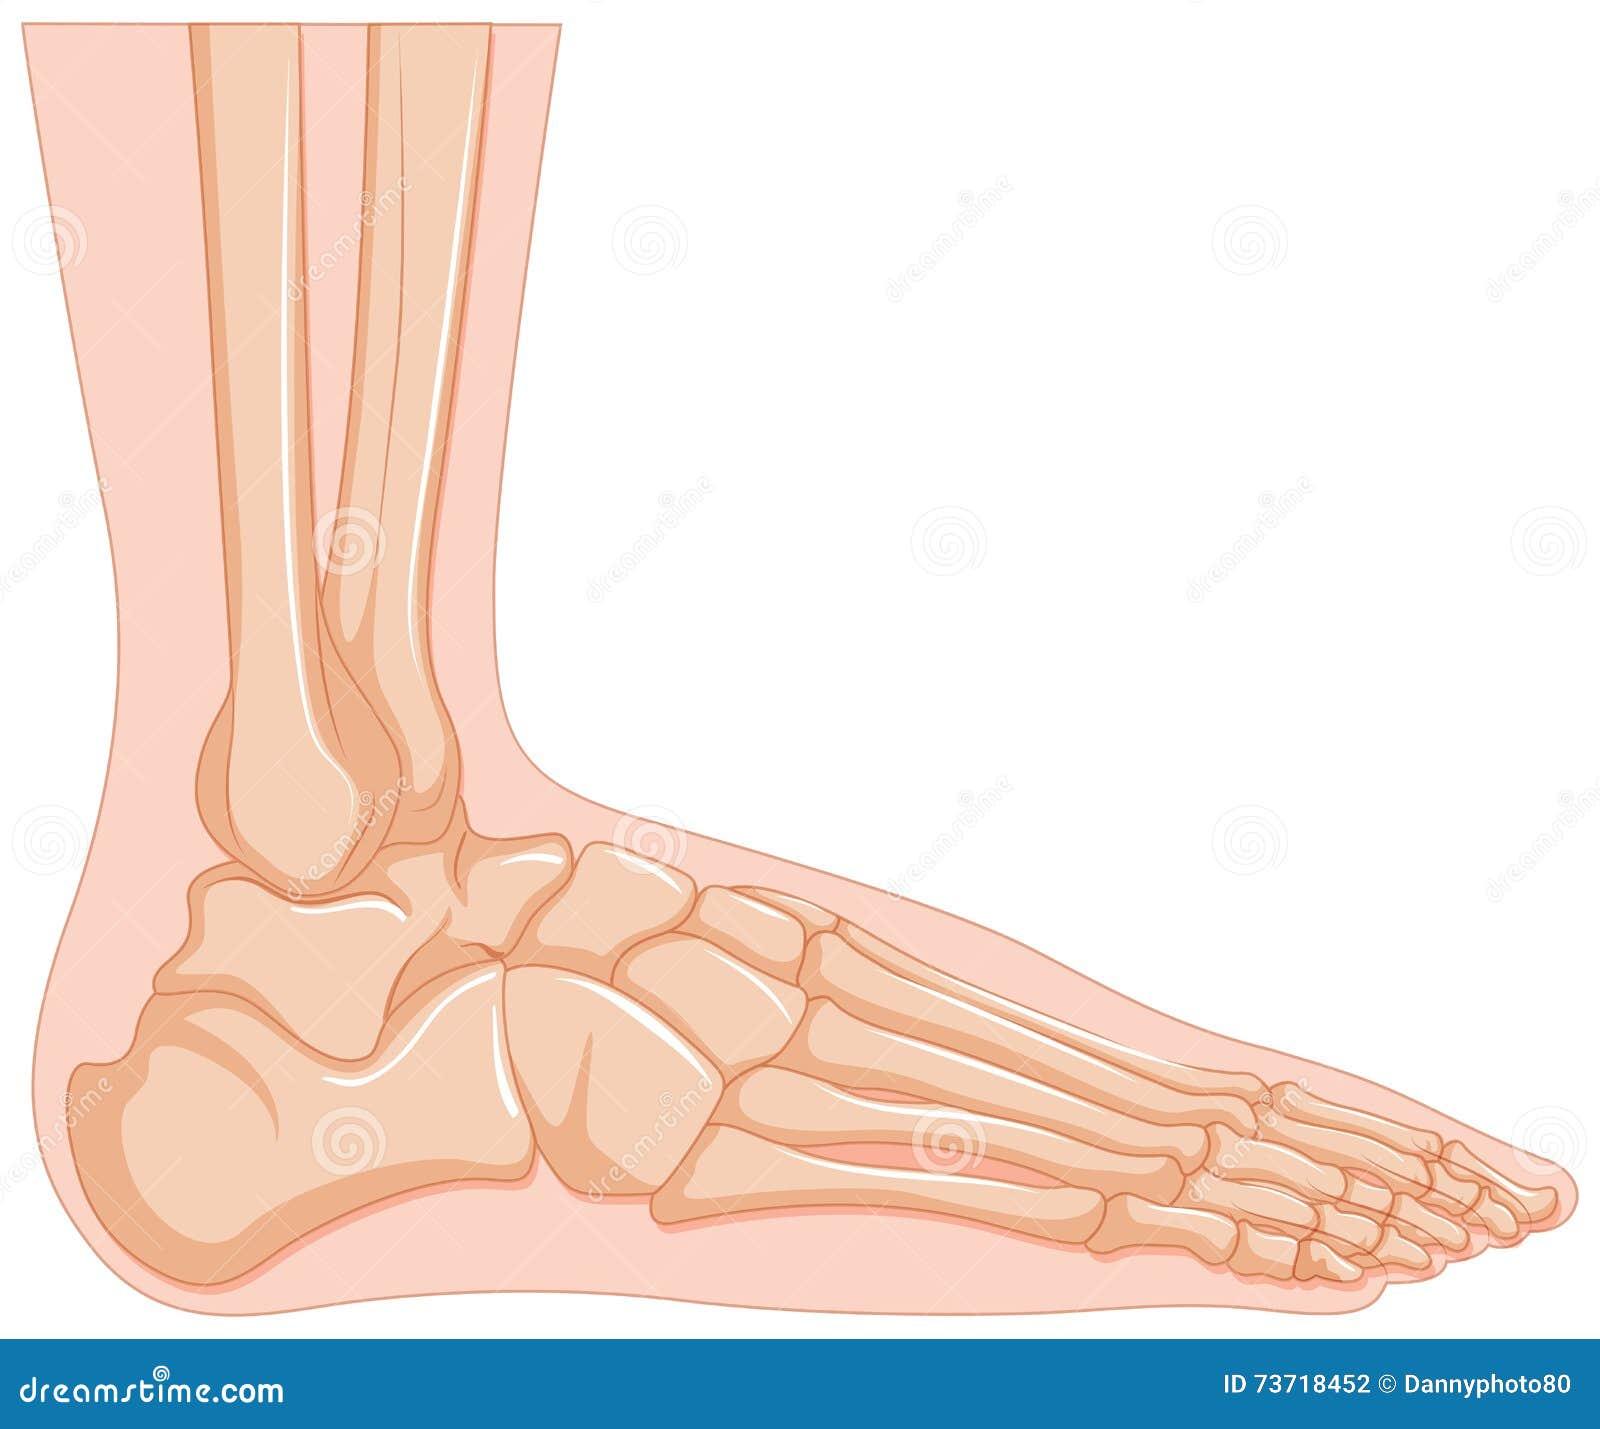 Inside of human foot bone stock vector. Illustration of sickness ...